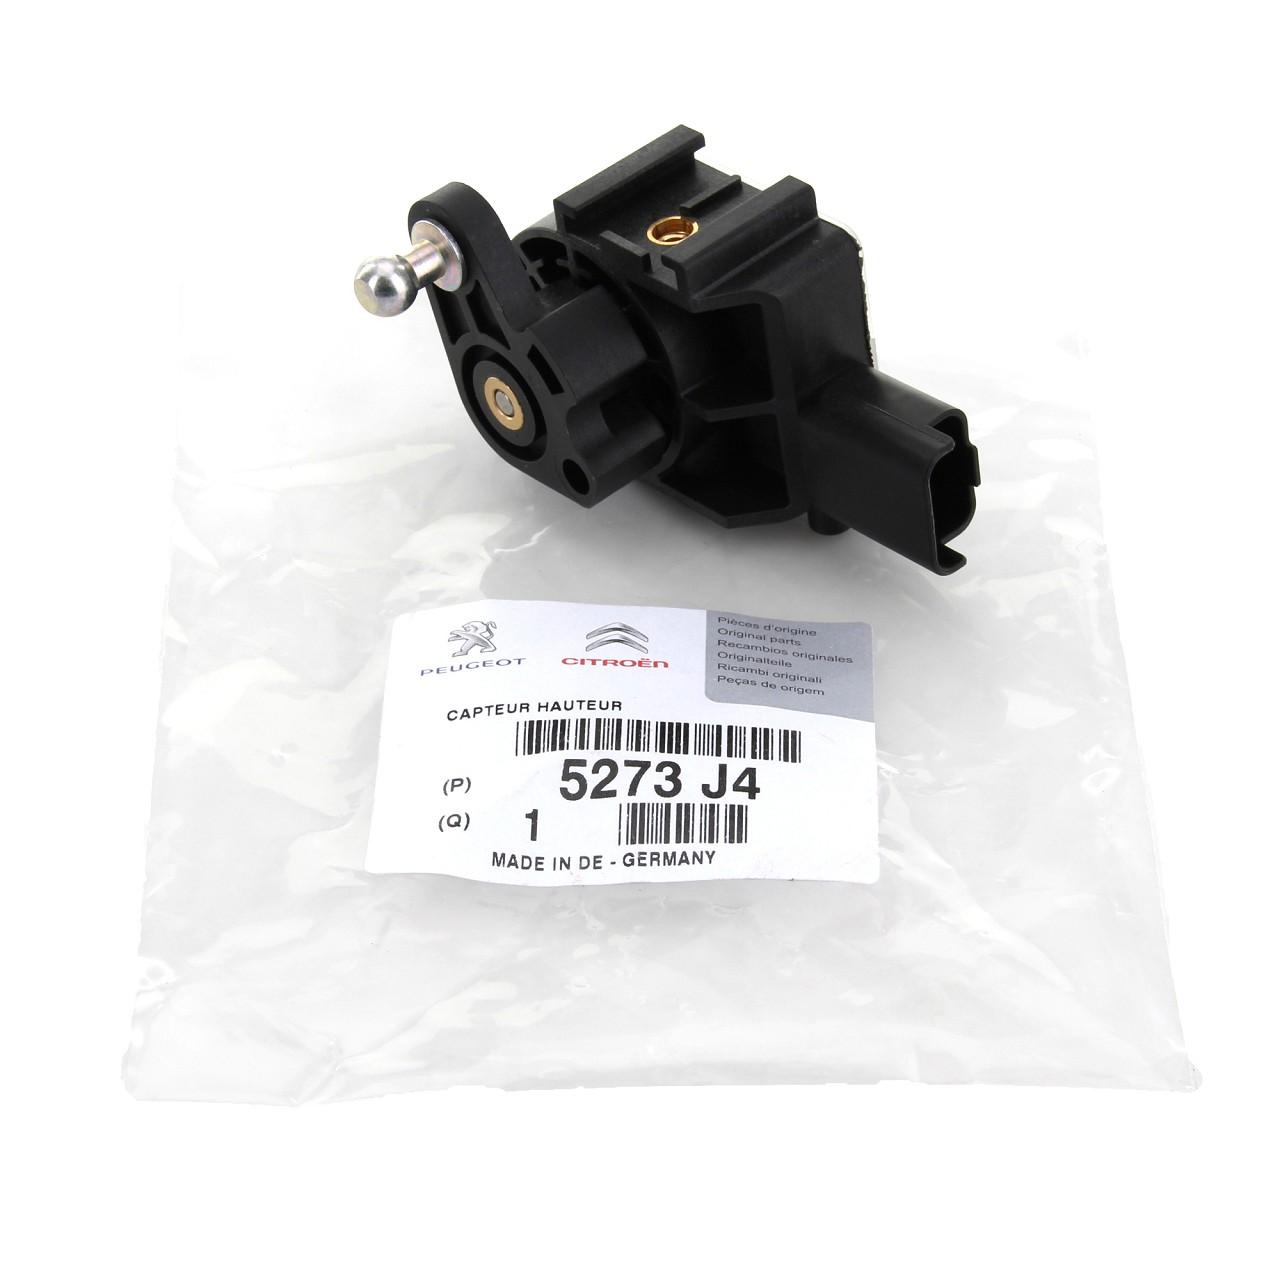 ORIGINAL Citroen Sensor Leuchtweitenregulierung Höhenstandssensor C5 C6 5273.J4